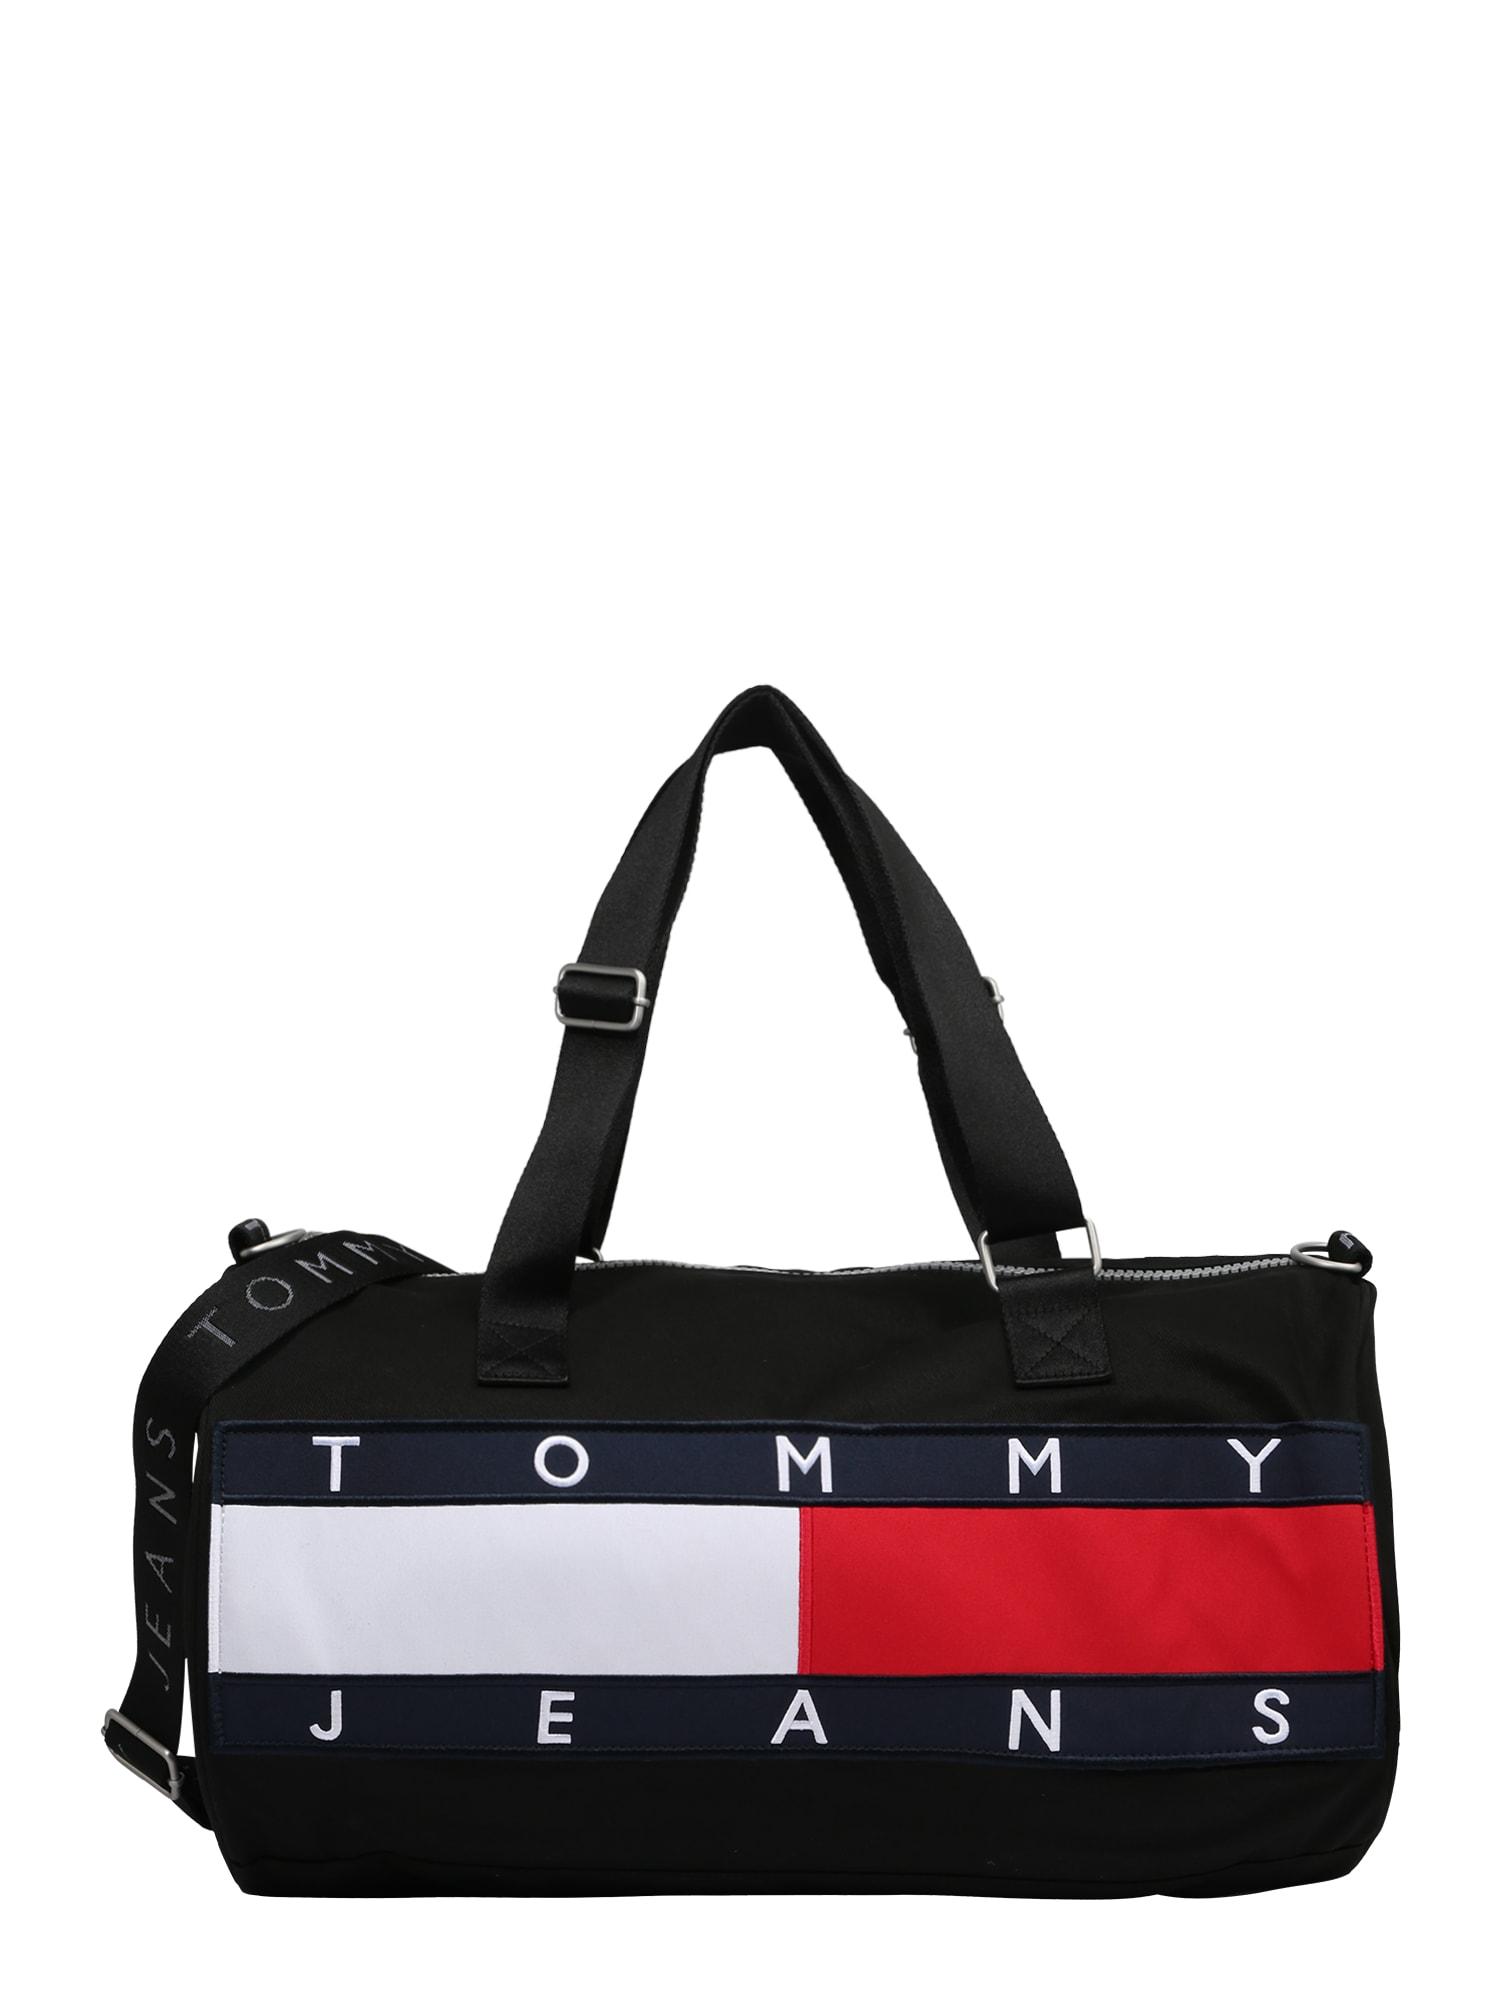 Tommy Jeans Kelioninis krepšys juoda / tamsiai mėlyna / balta / raudona